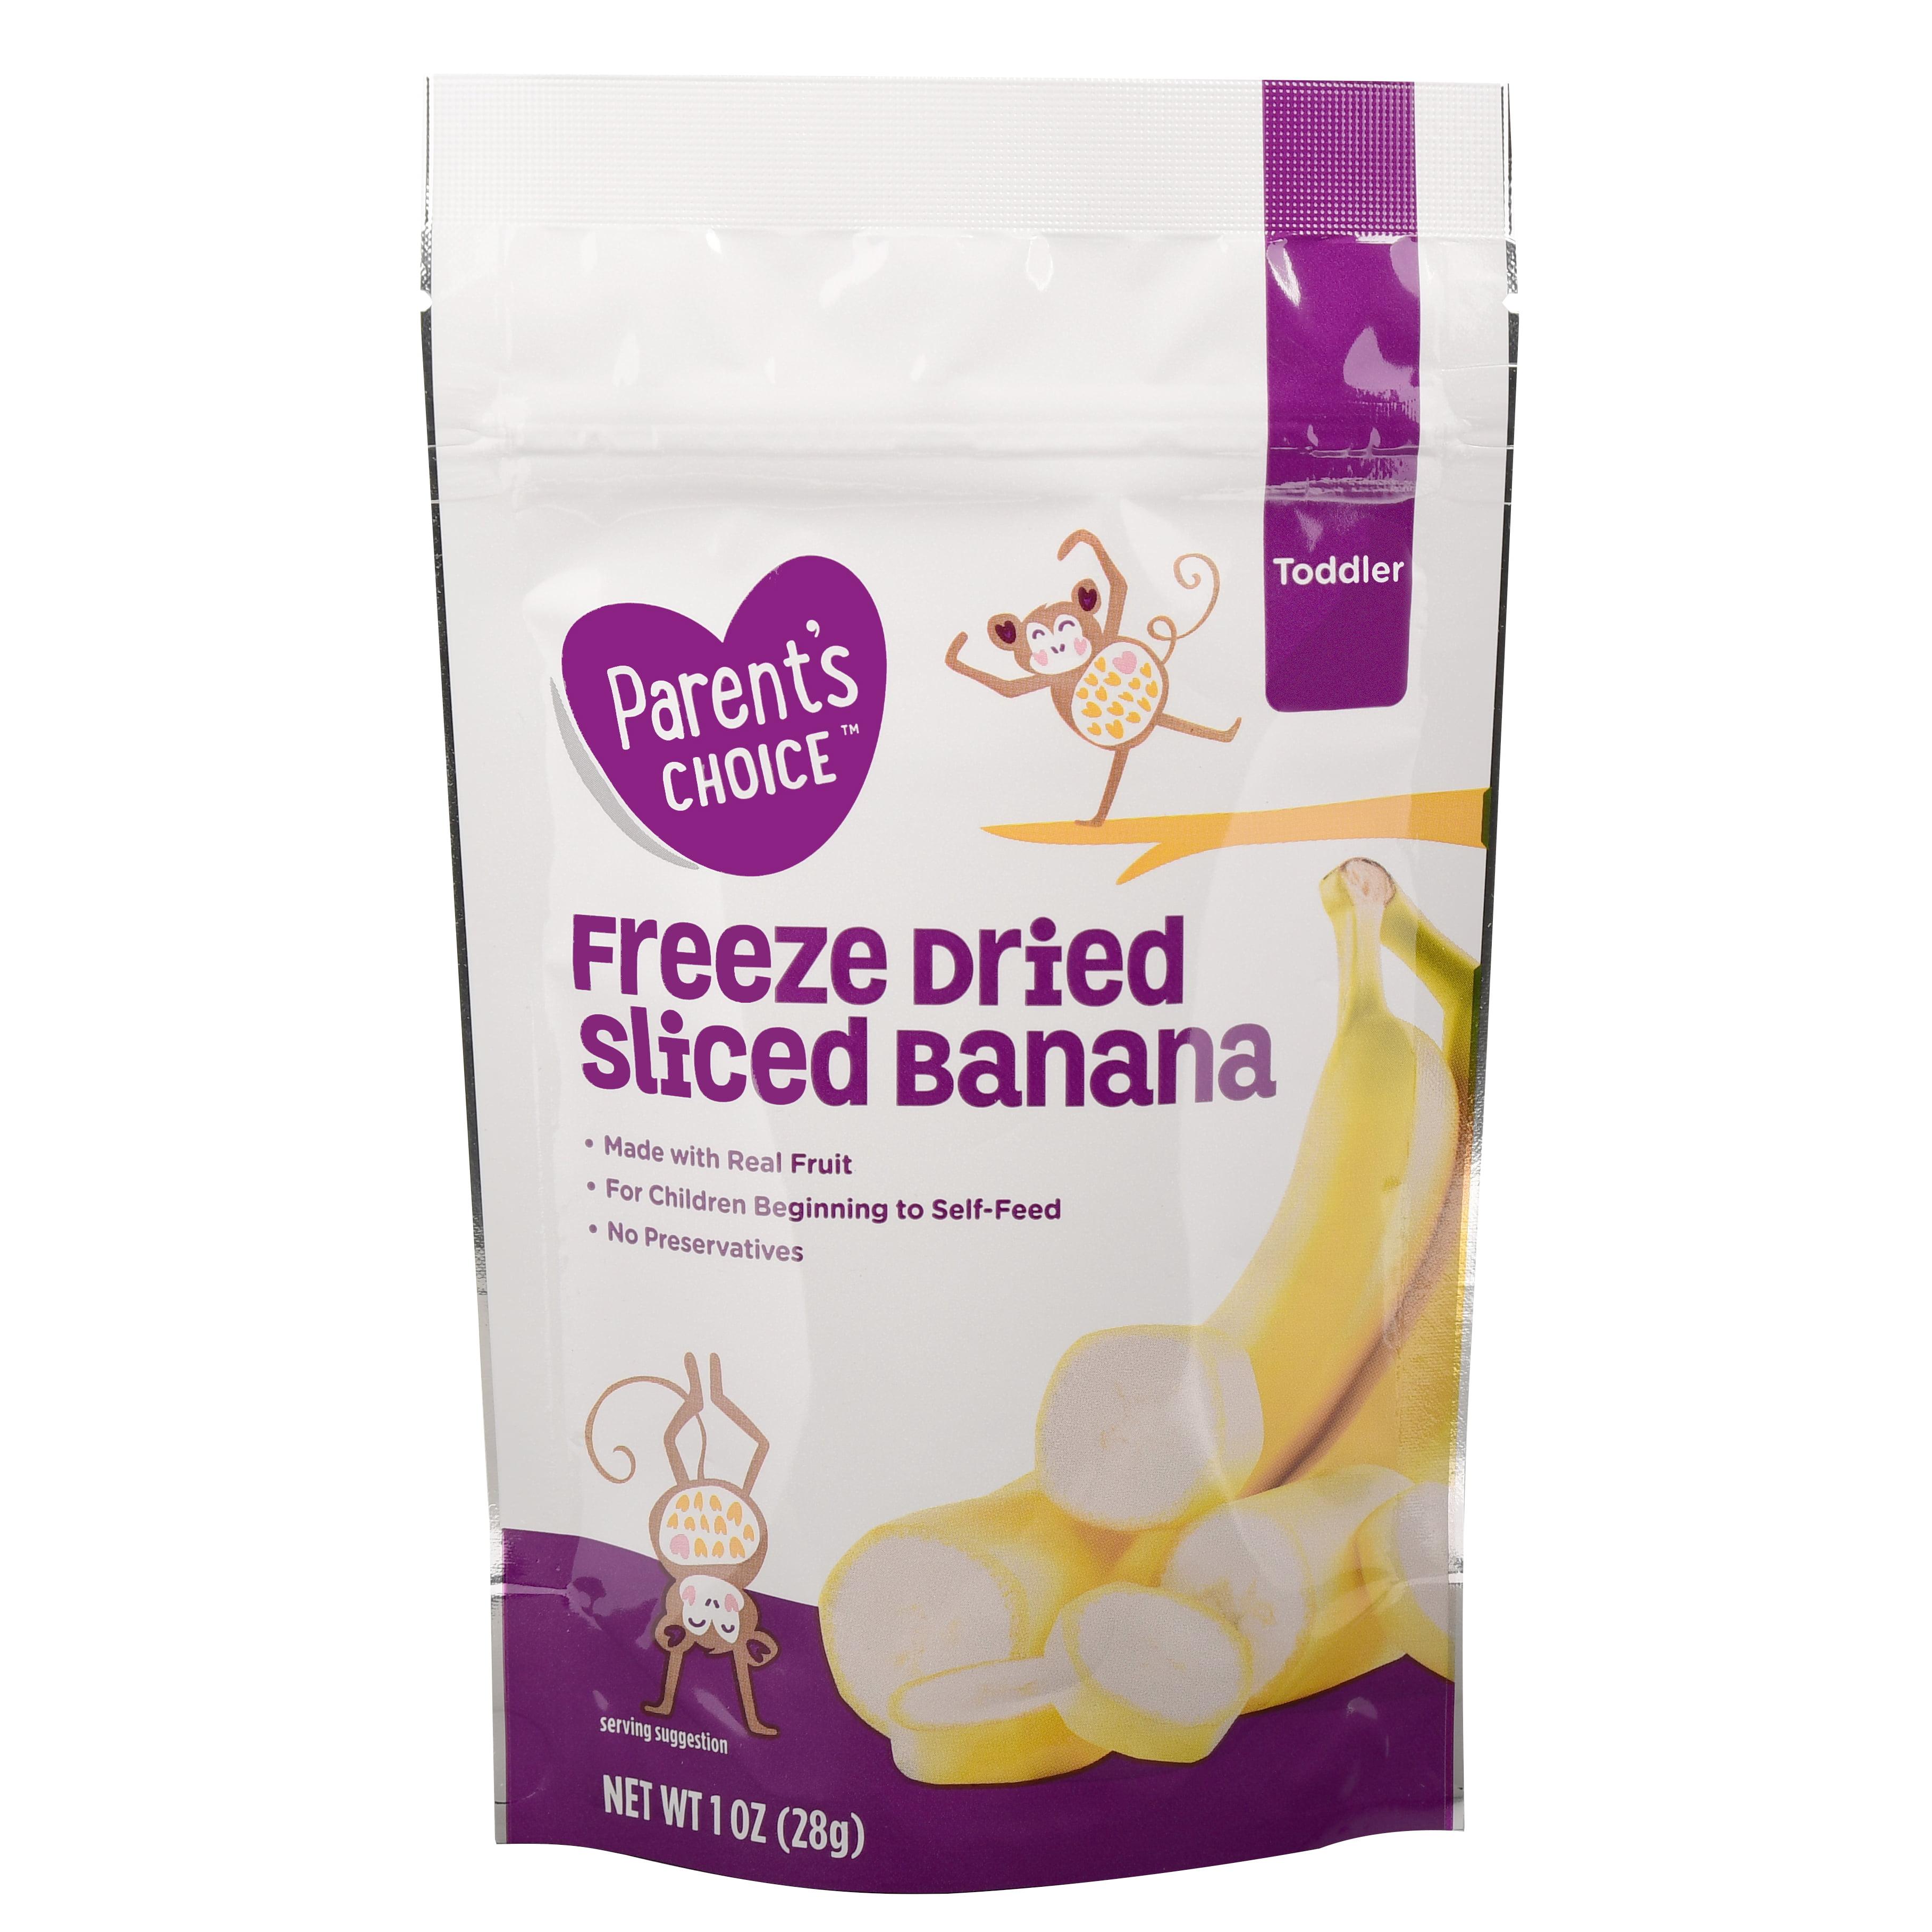 Parent's Choice Freeze Dried Sliced Banana, Toddler, 1 oz